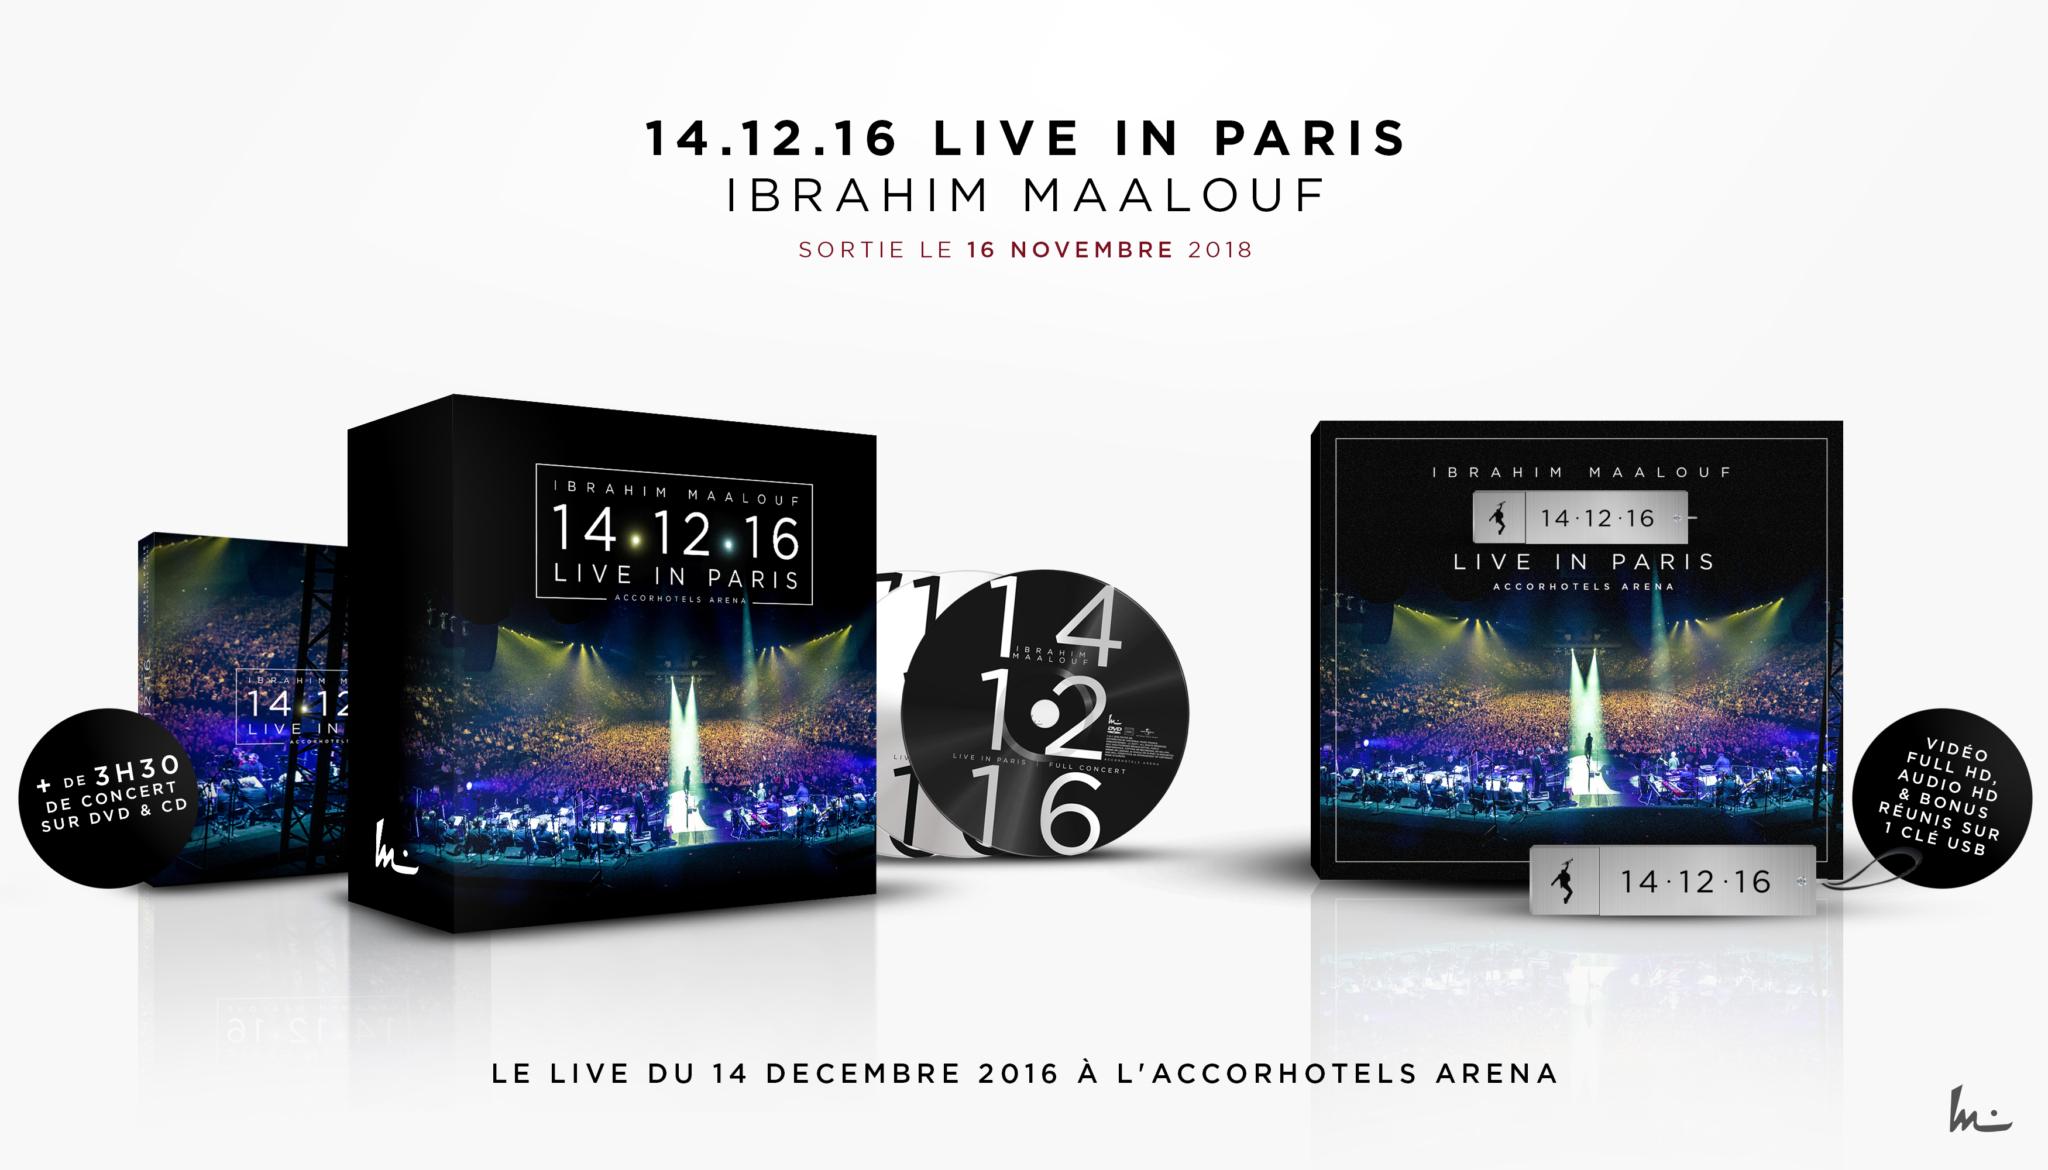 Ibrahim Maalouf -  14.12.16 Live in Paris